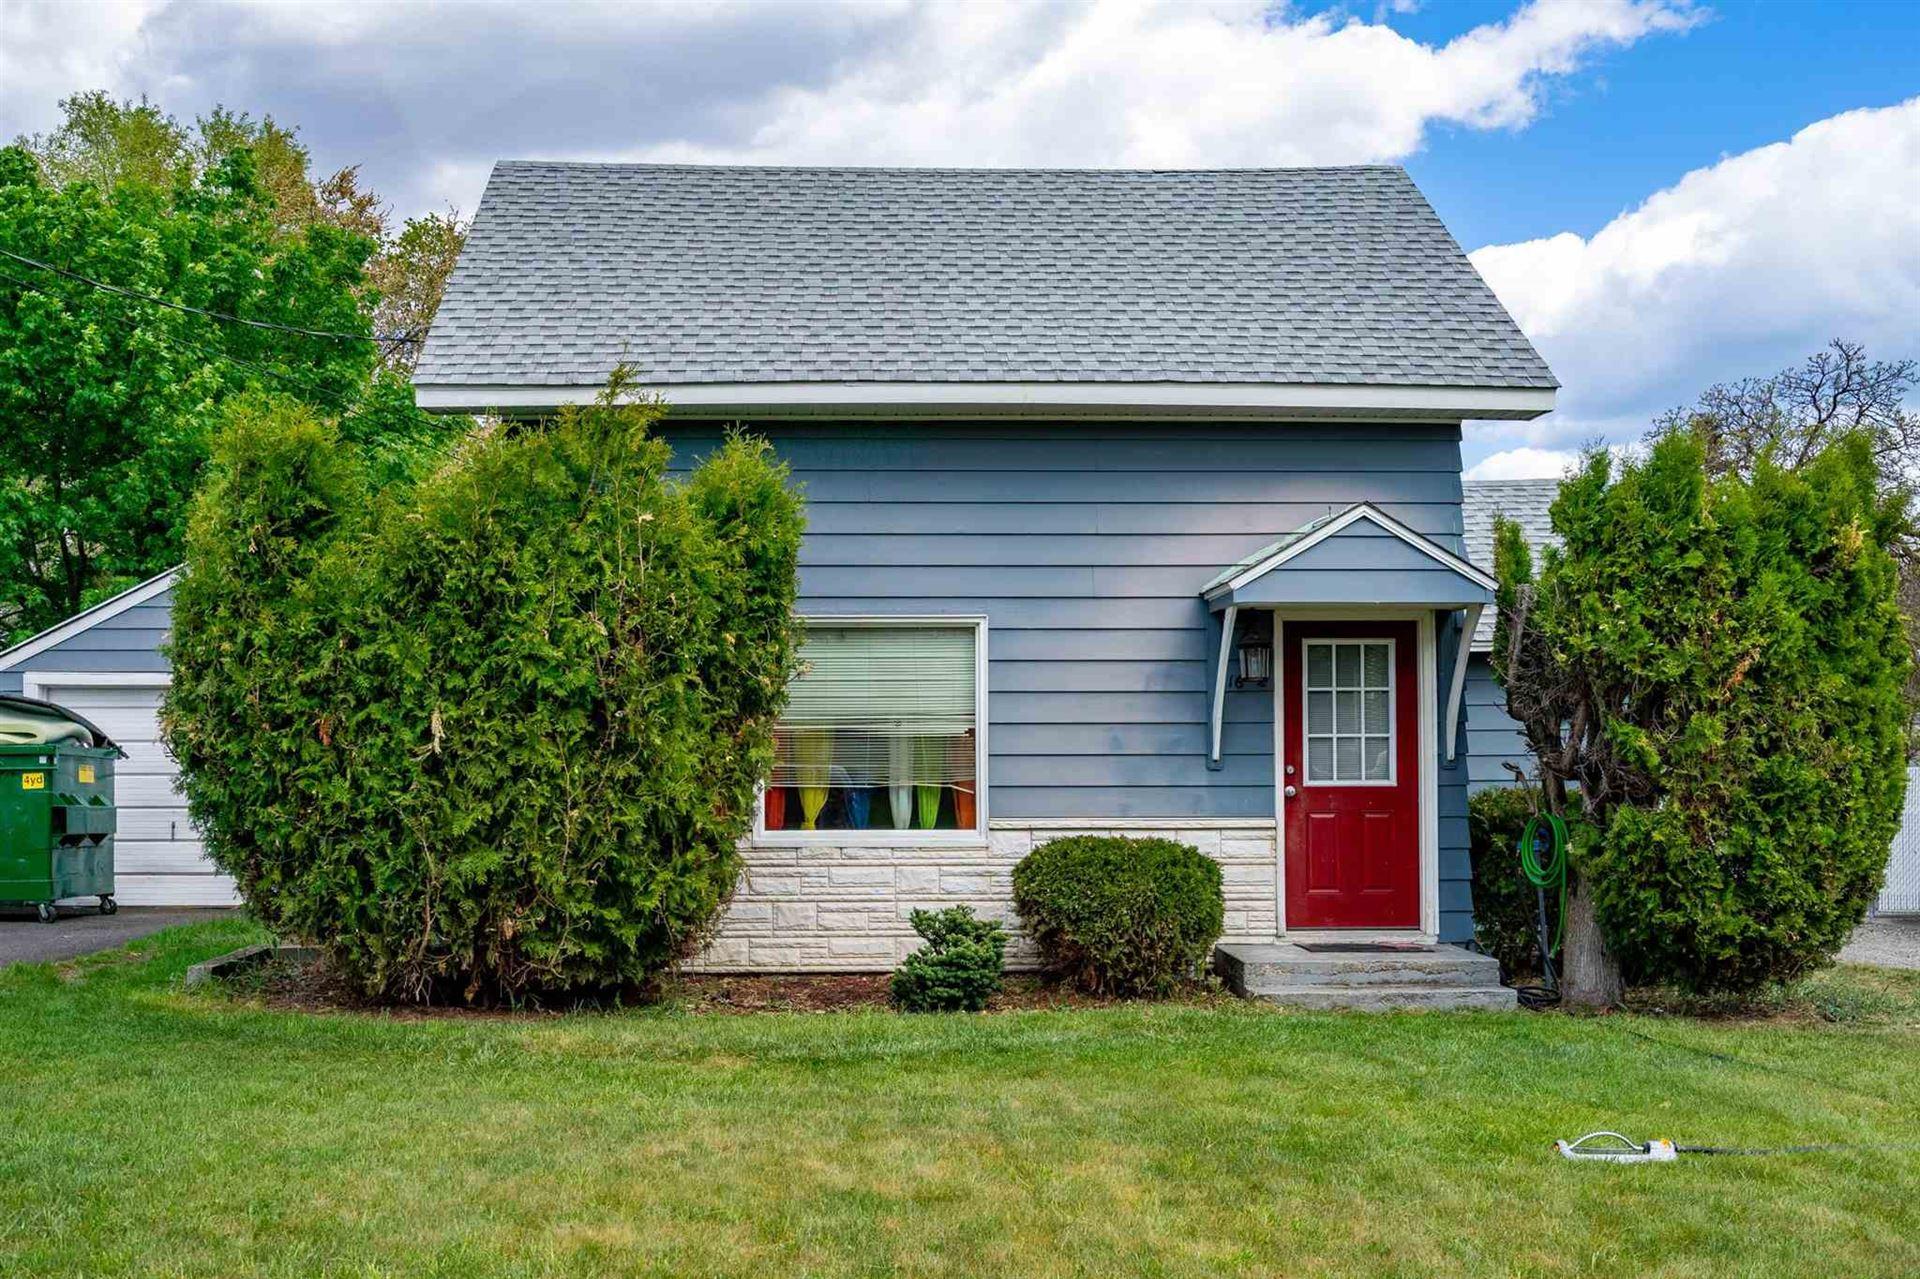 1622 N woodruff Rd, Spokane Valley, WA 99206 - #: 202115359